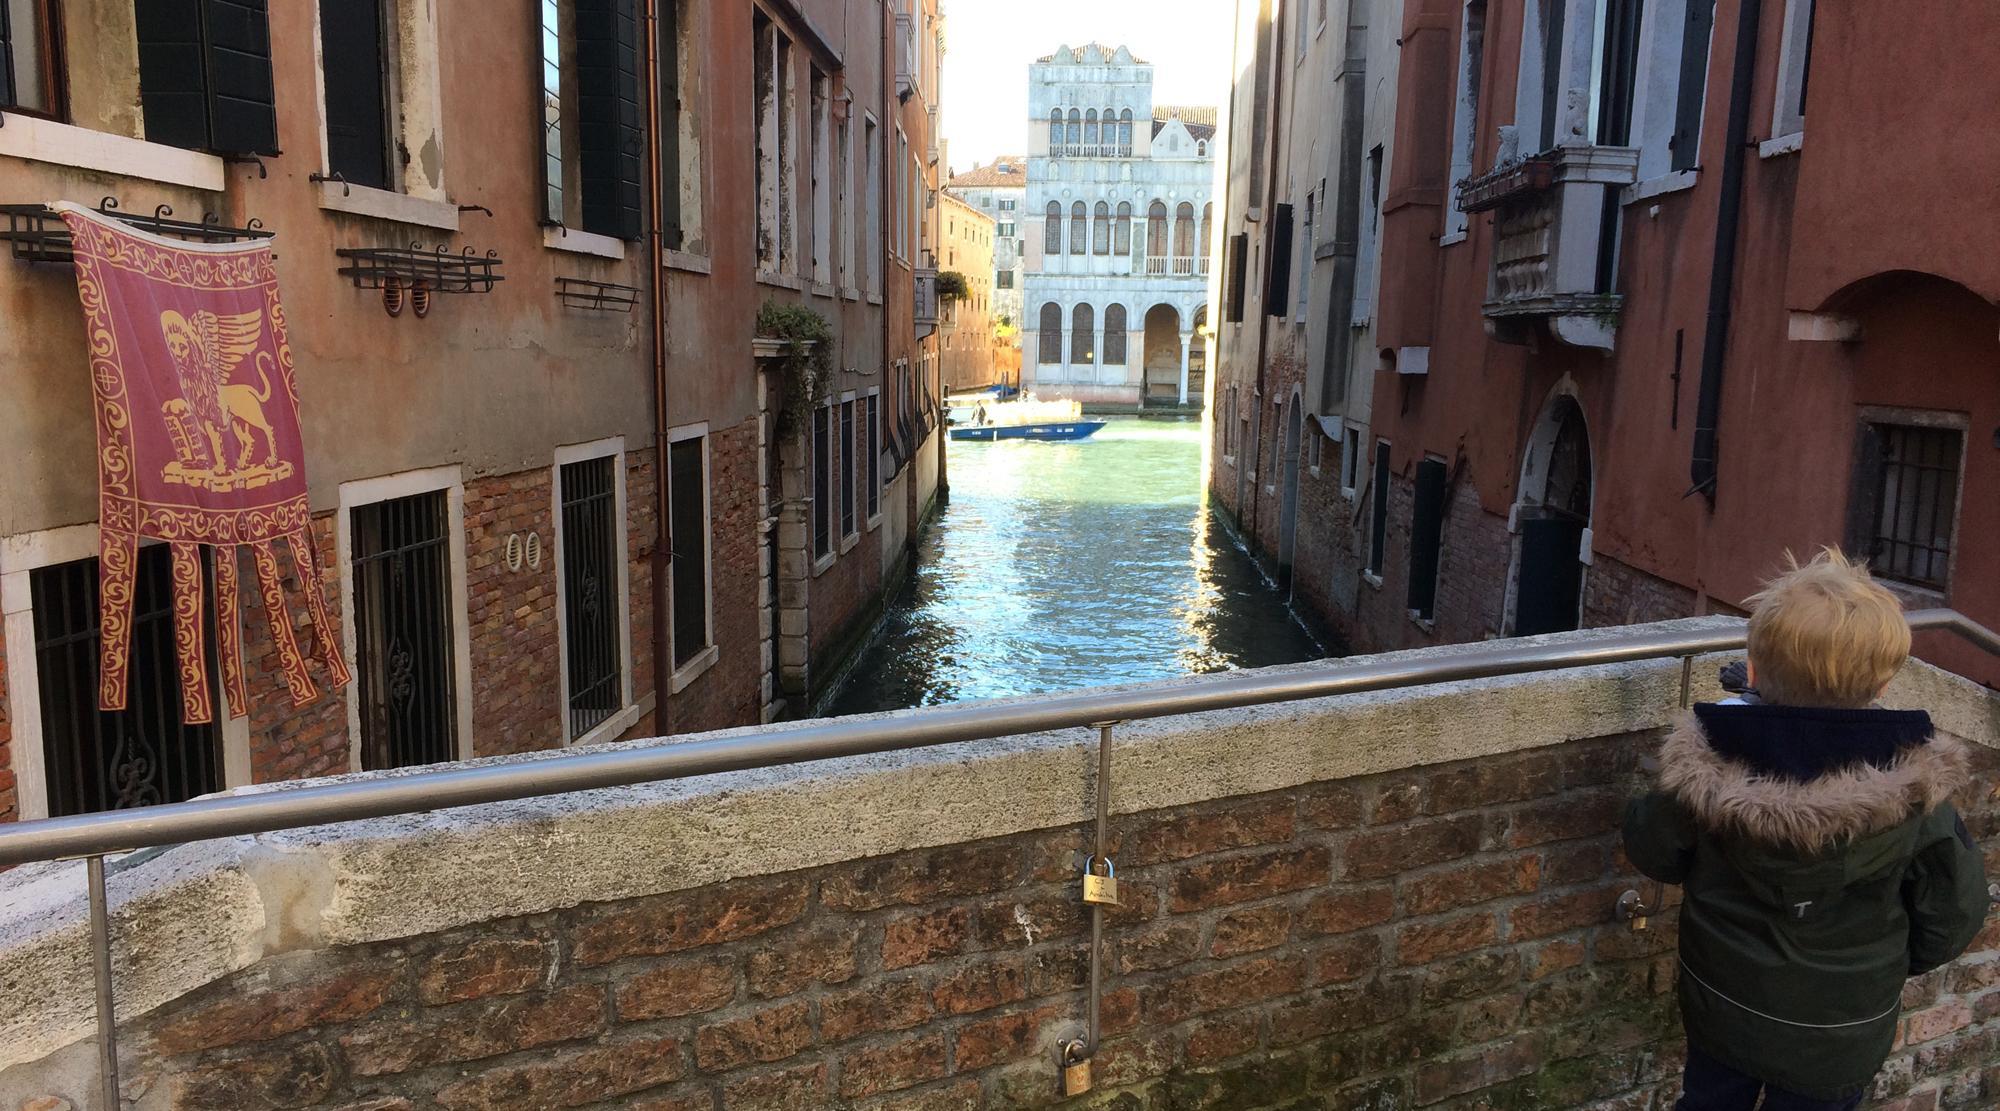 Venedig mit Kindern - Bruecke mit Fahne